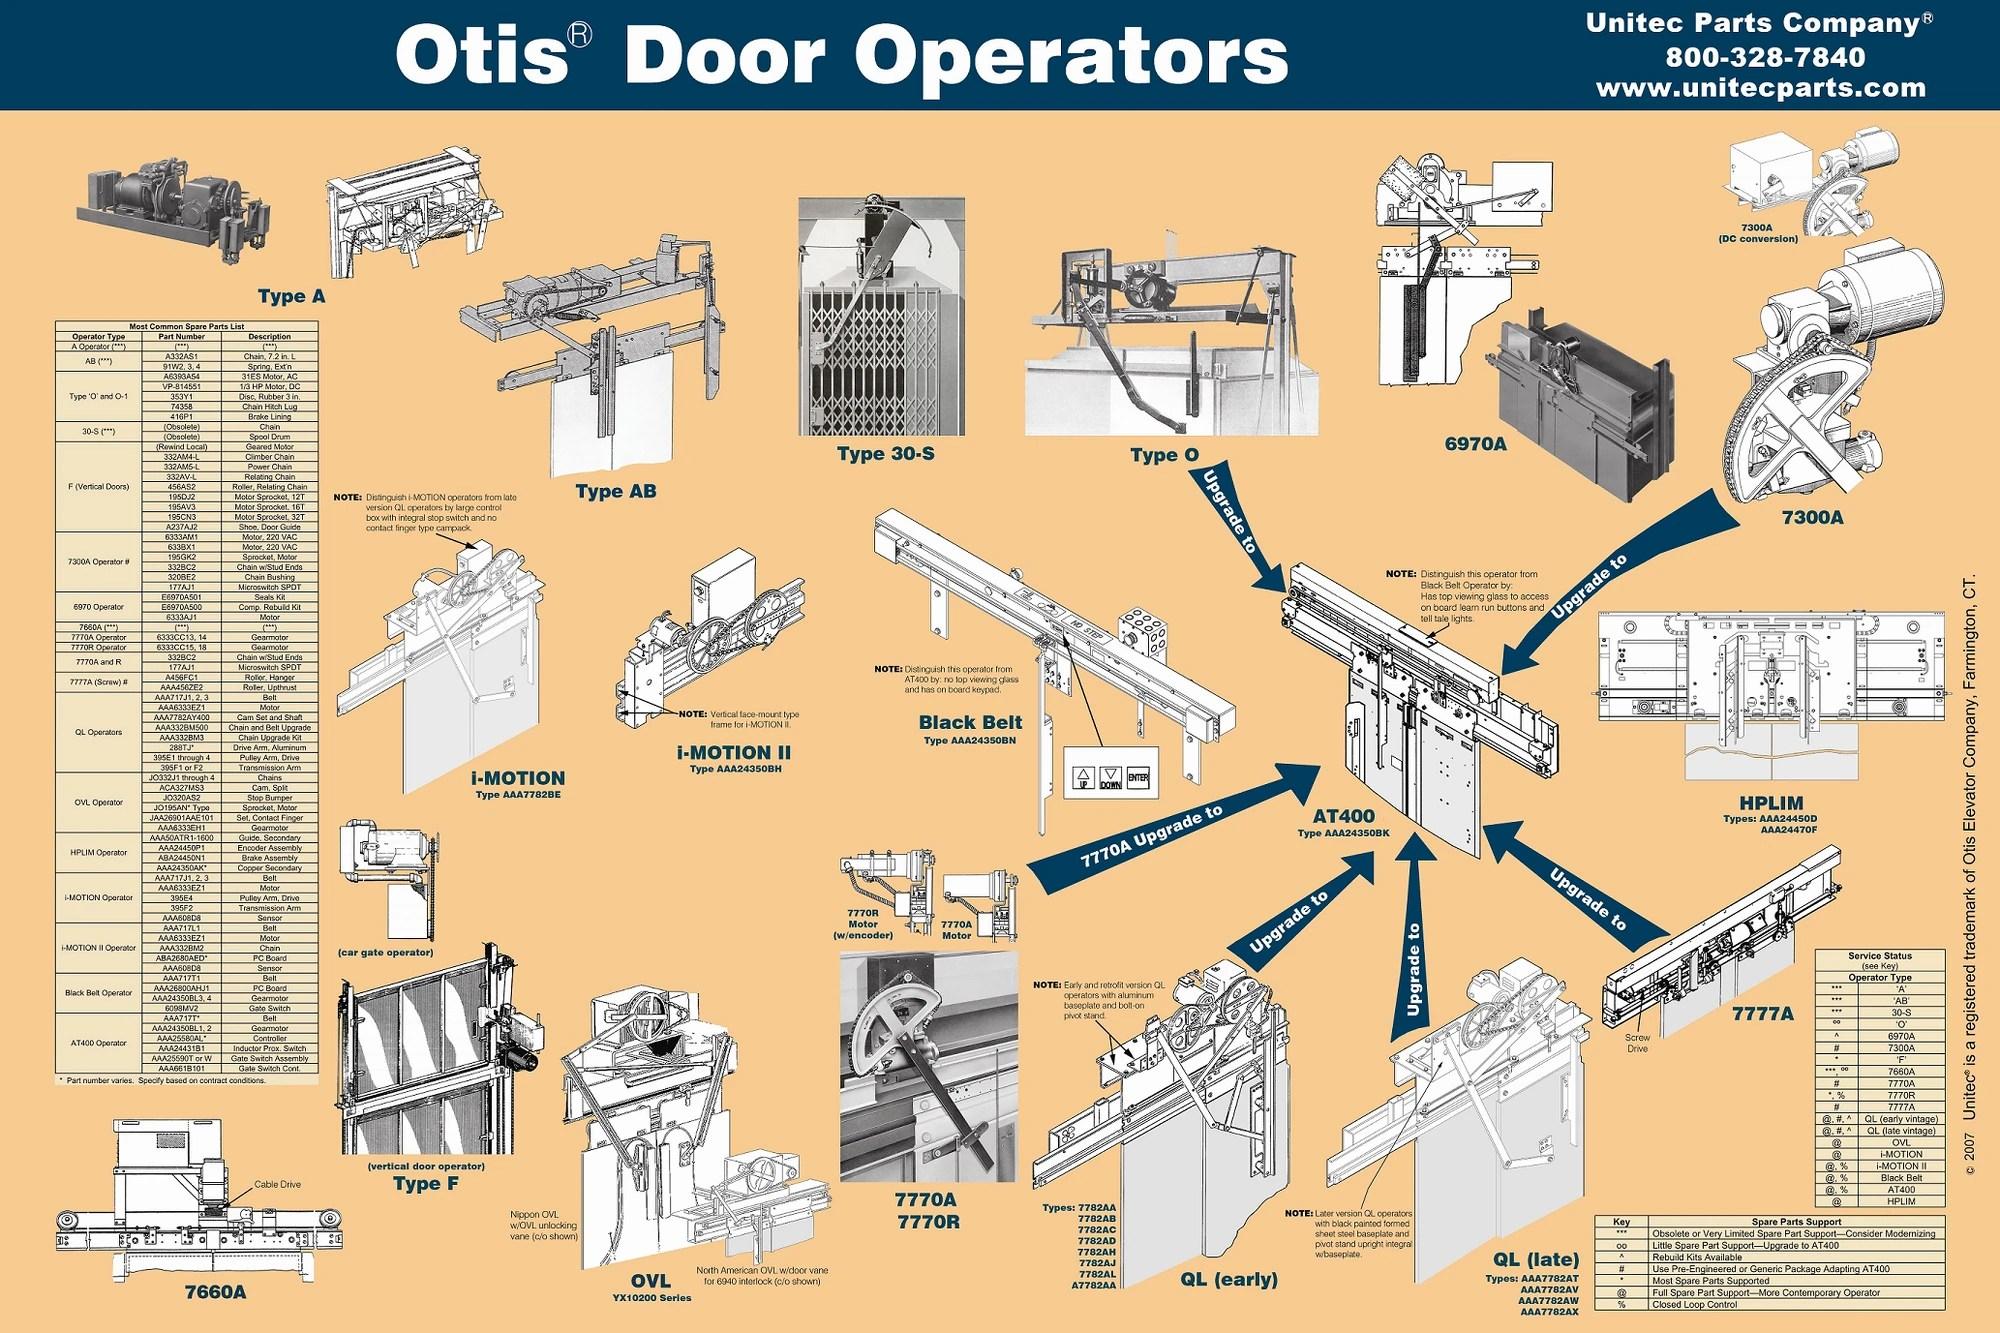 otis wiring diagram wiring diagram schematics rh ksefanzone com otis elevator wiring diagram basic electrical wiring [ 2000 x 1333 Pixel ]